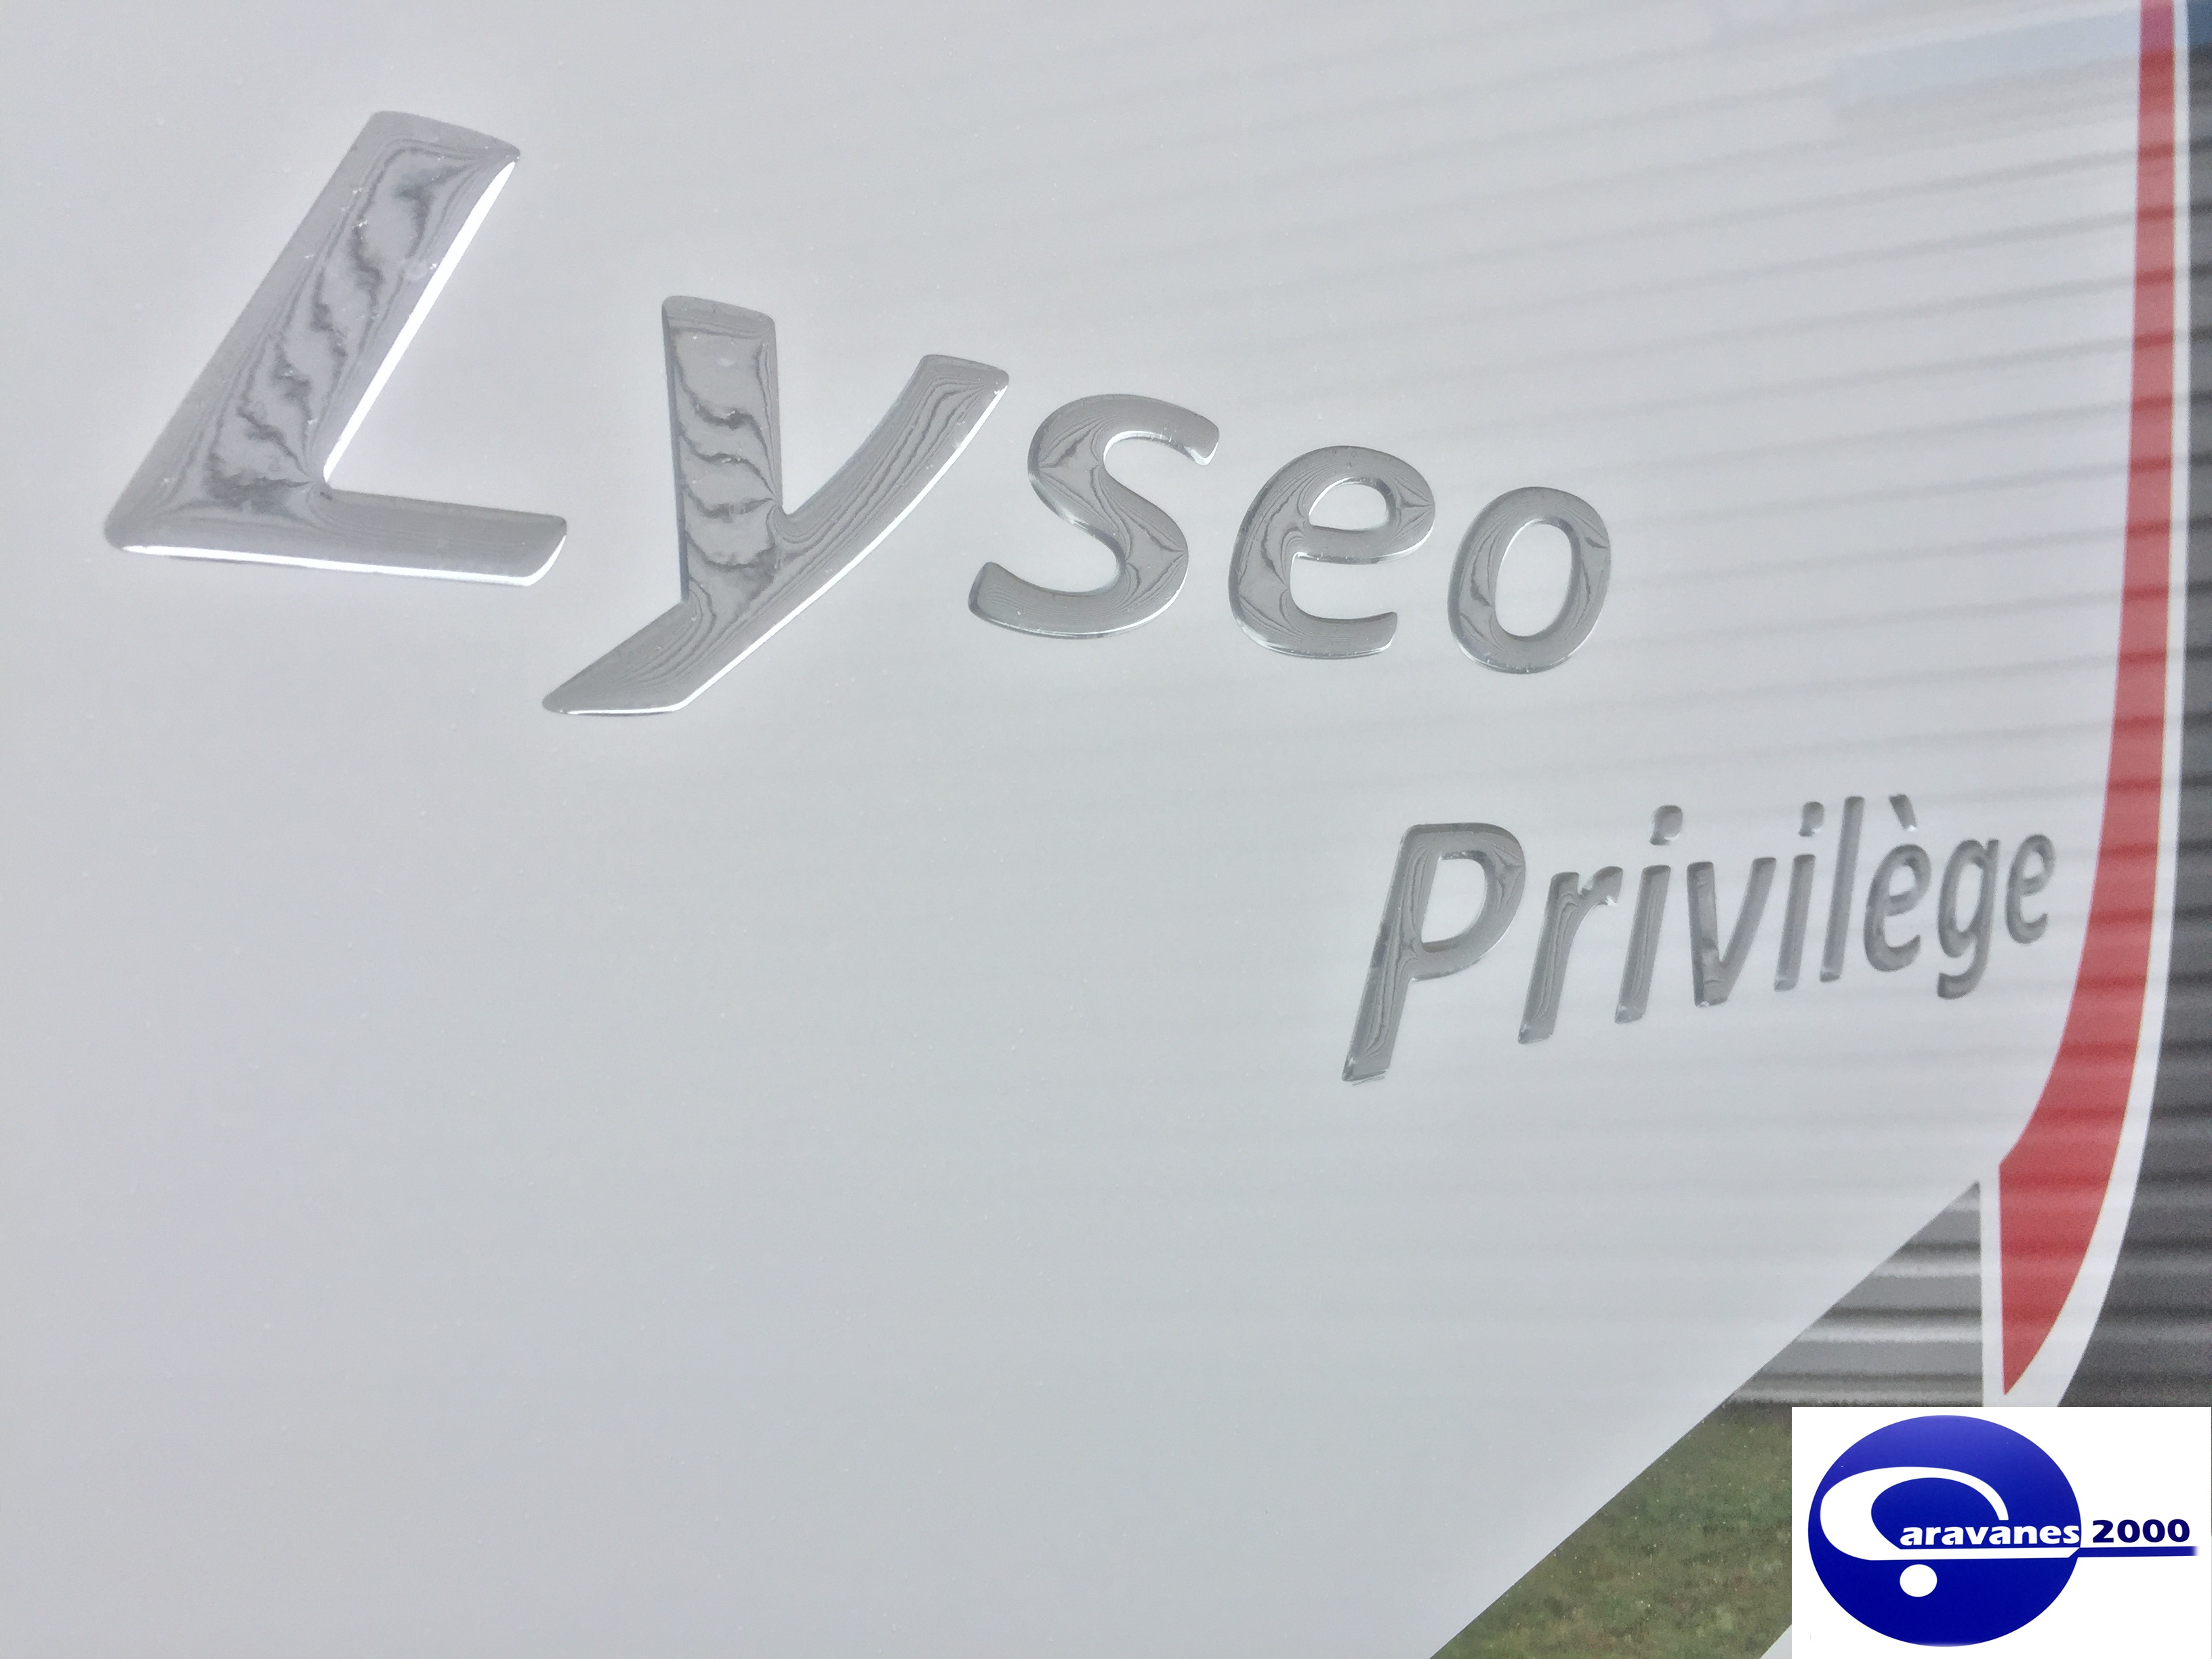 Burstner Lyseo T 734 Privilege